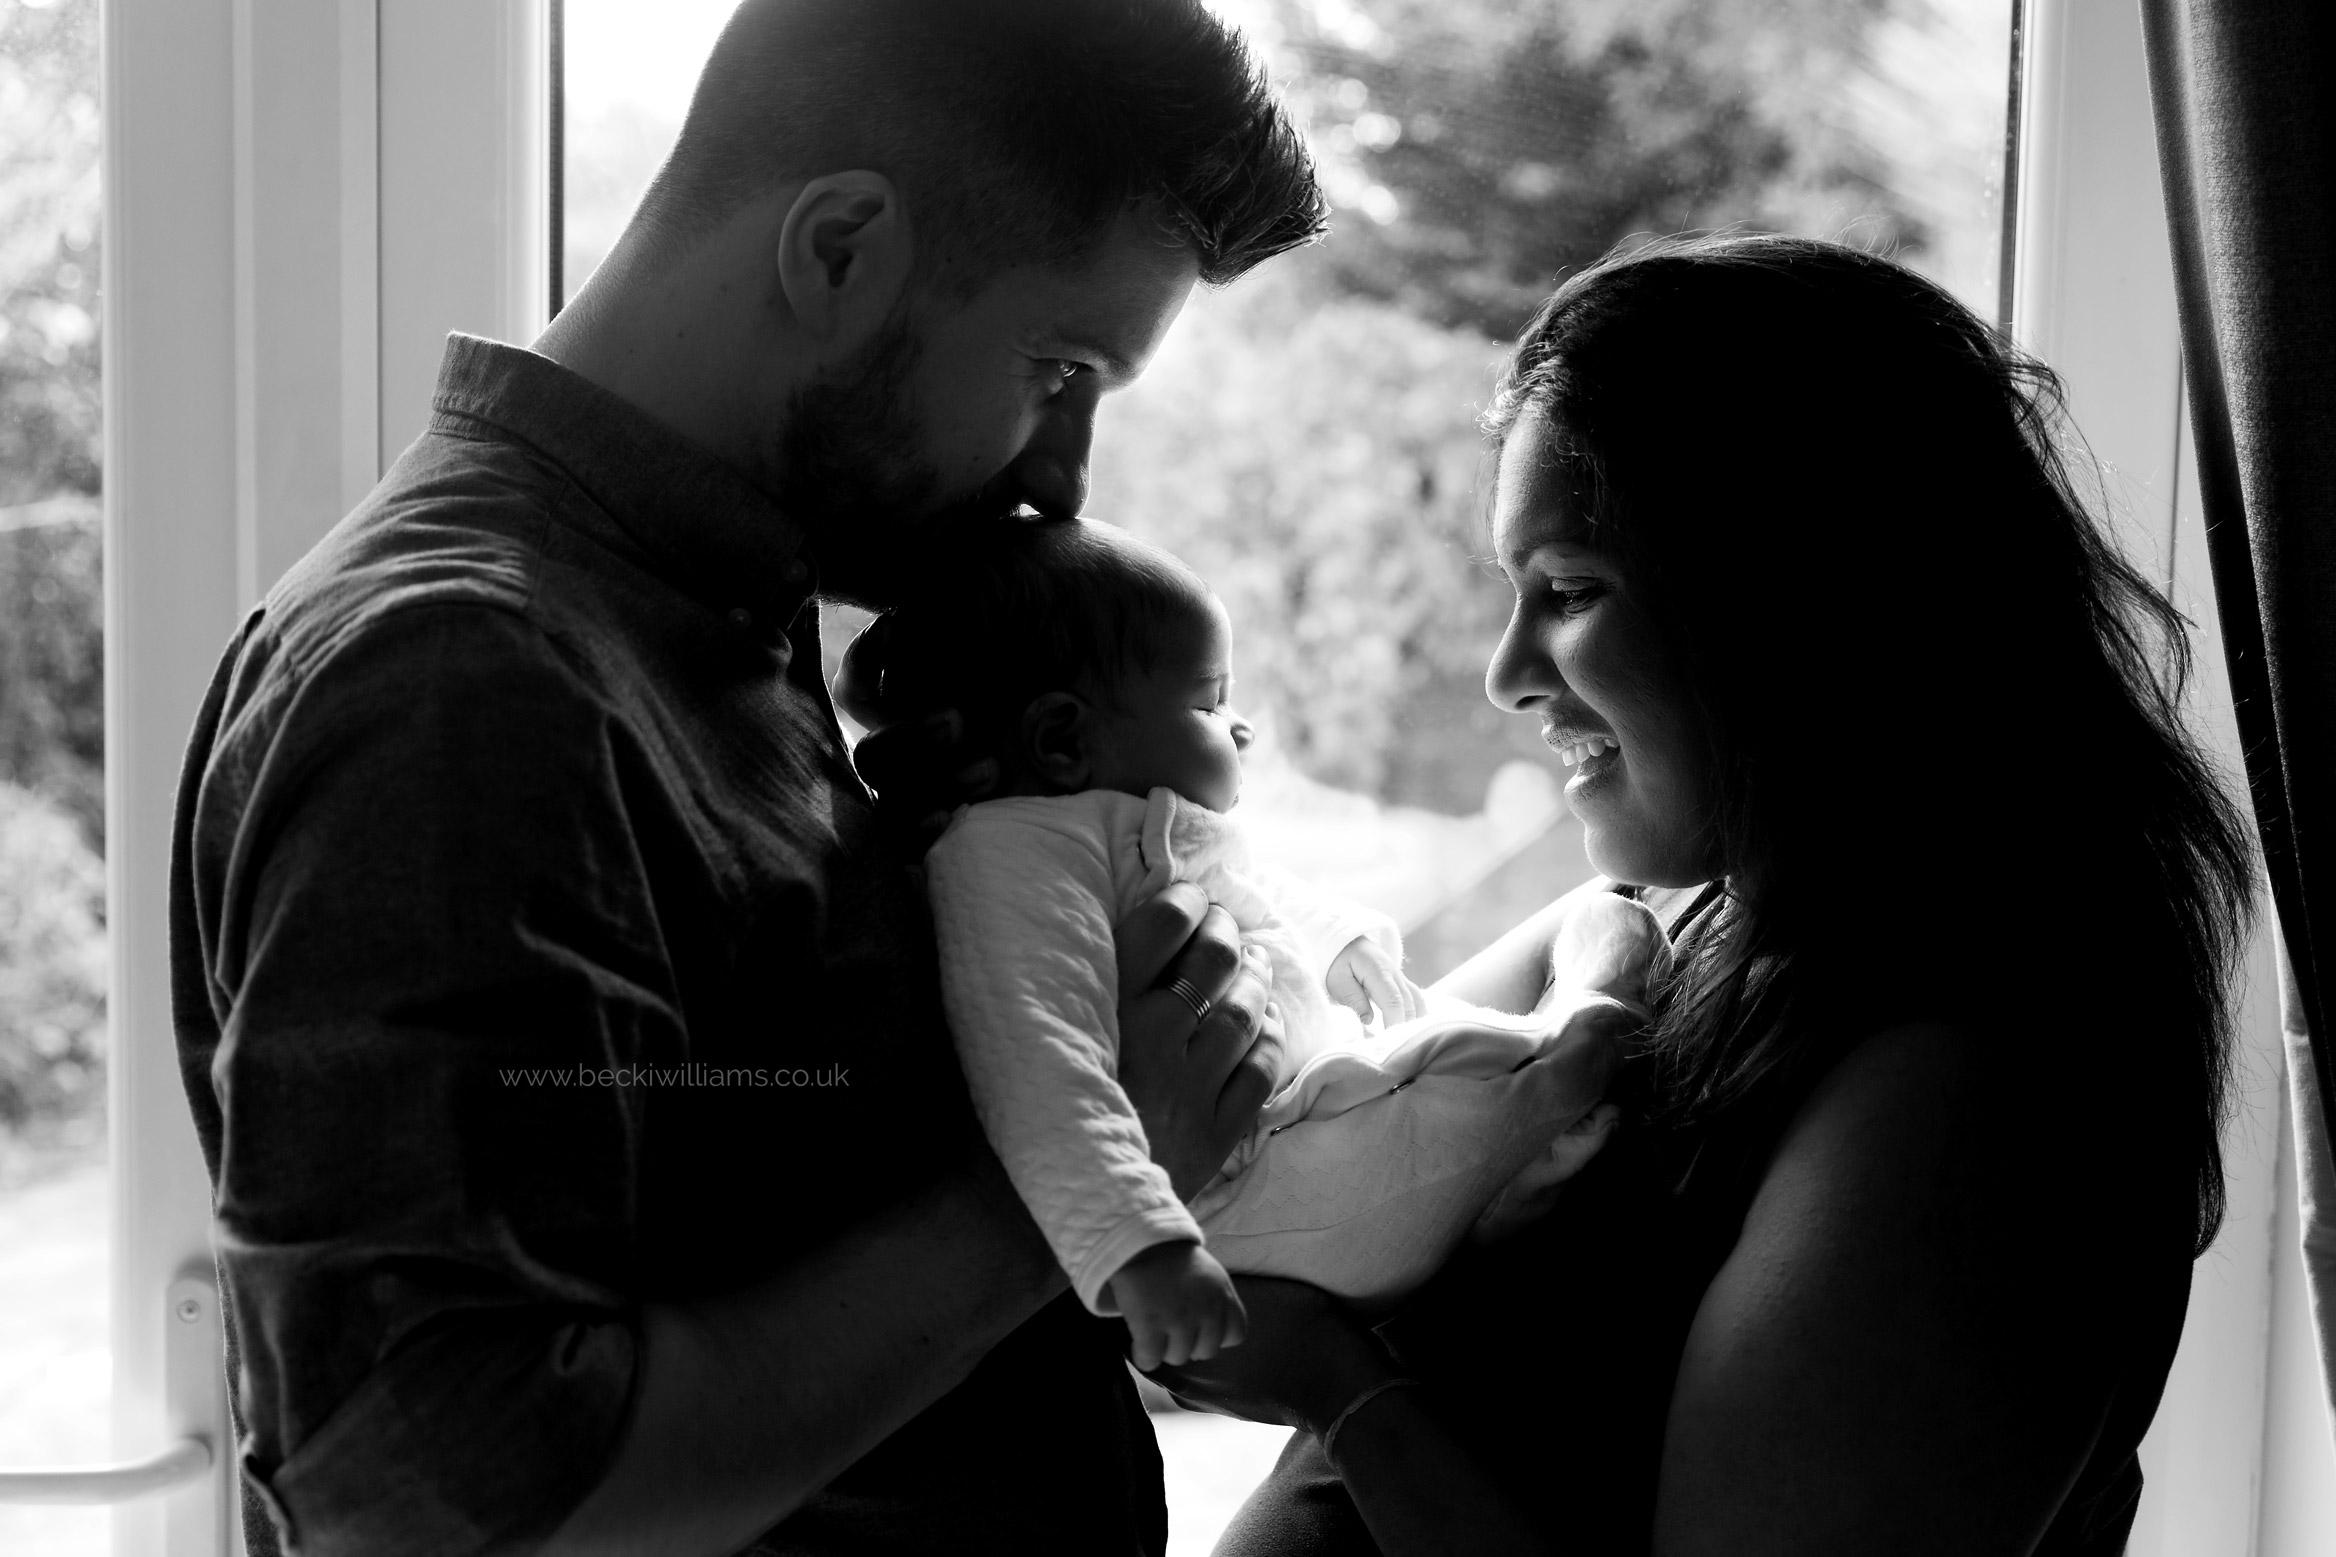 lifestyle-baby-photography-hemel-hempstead-window-light-new-parents.jpg